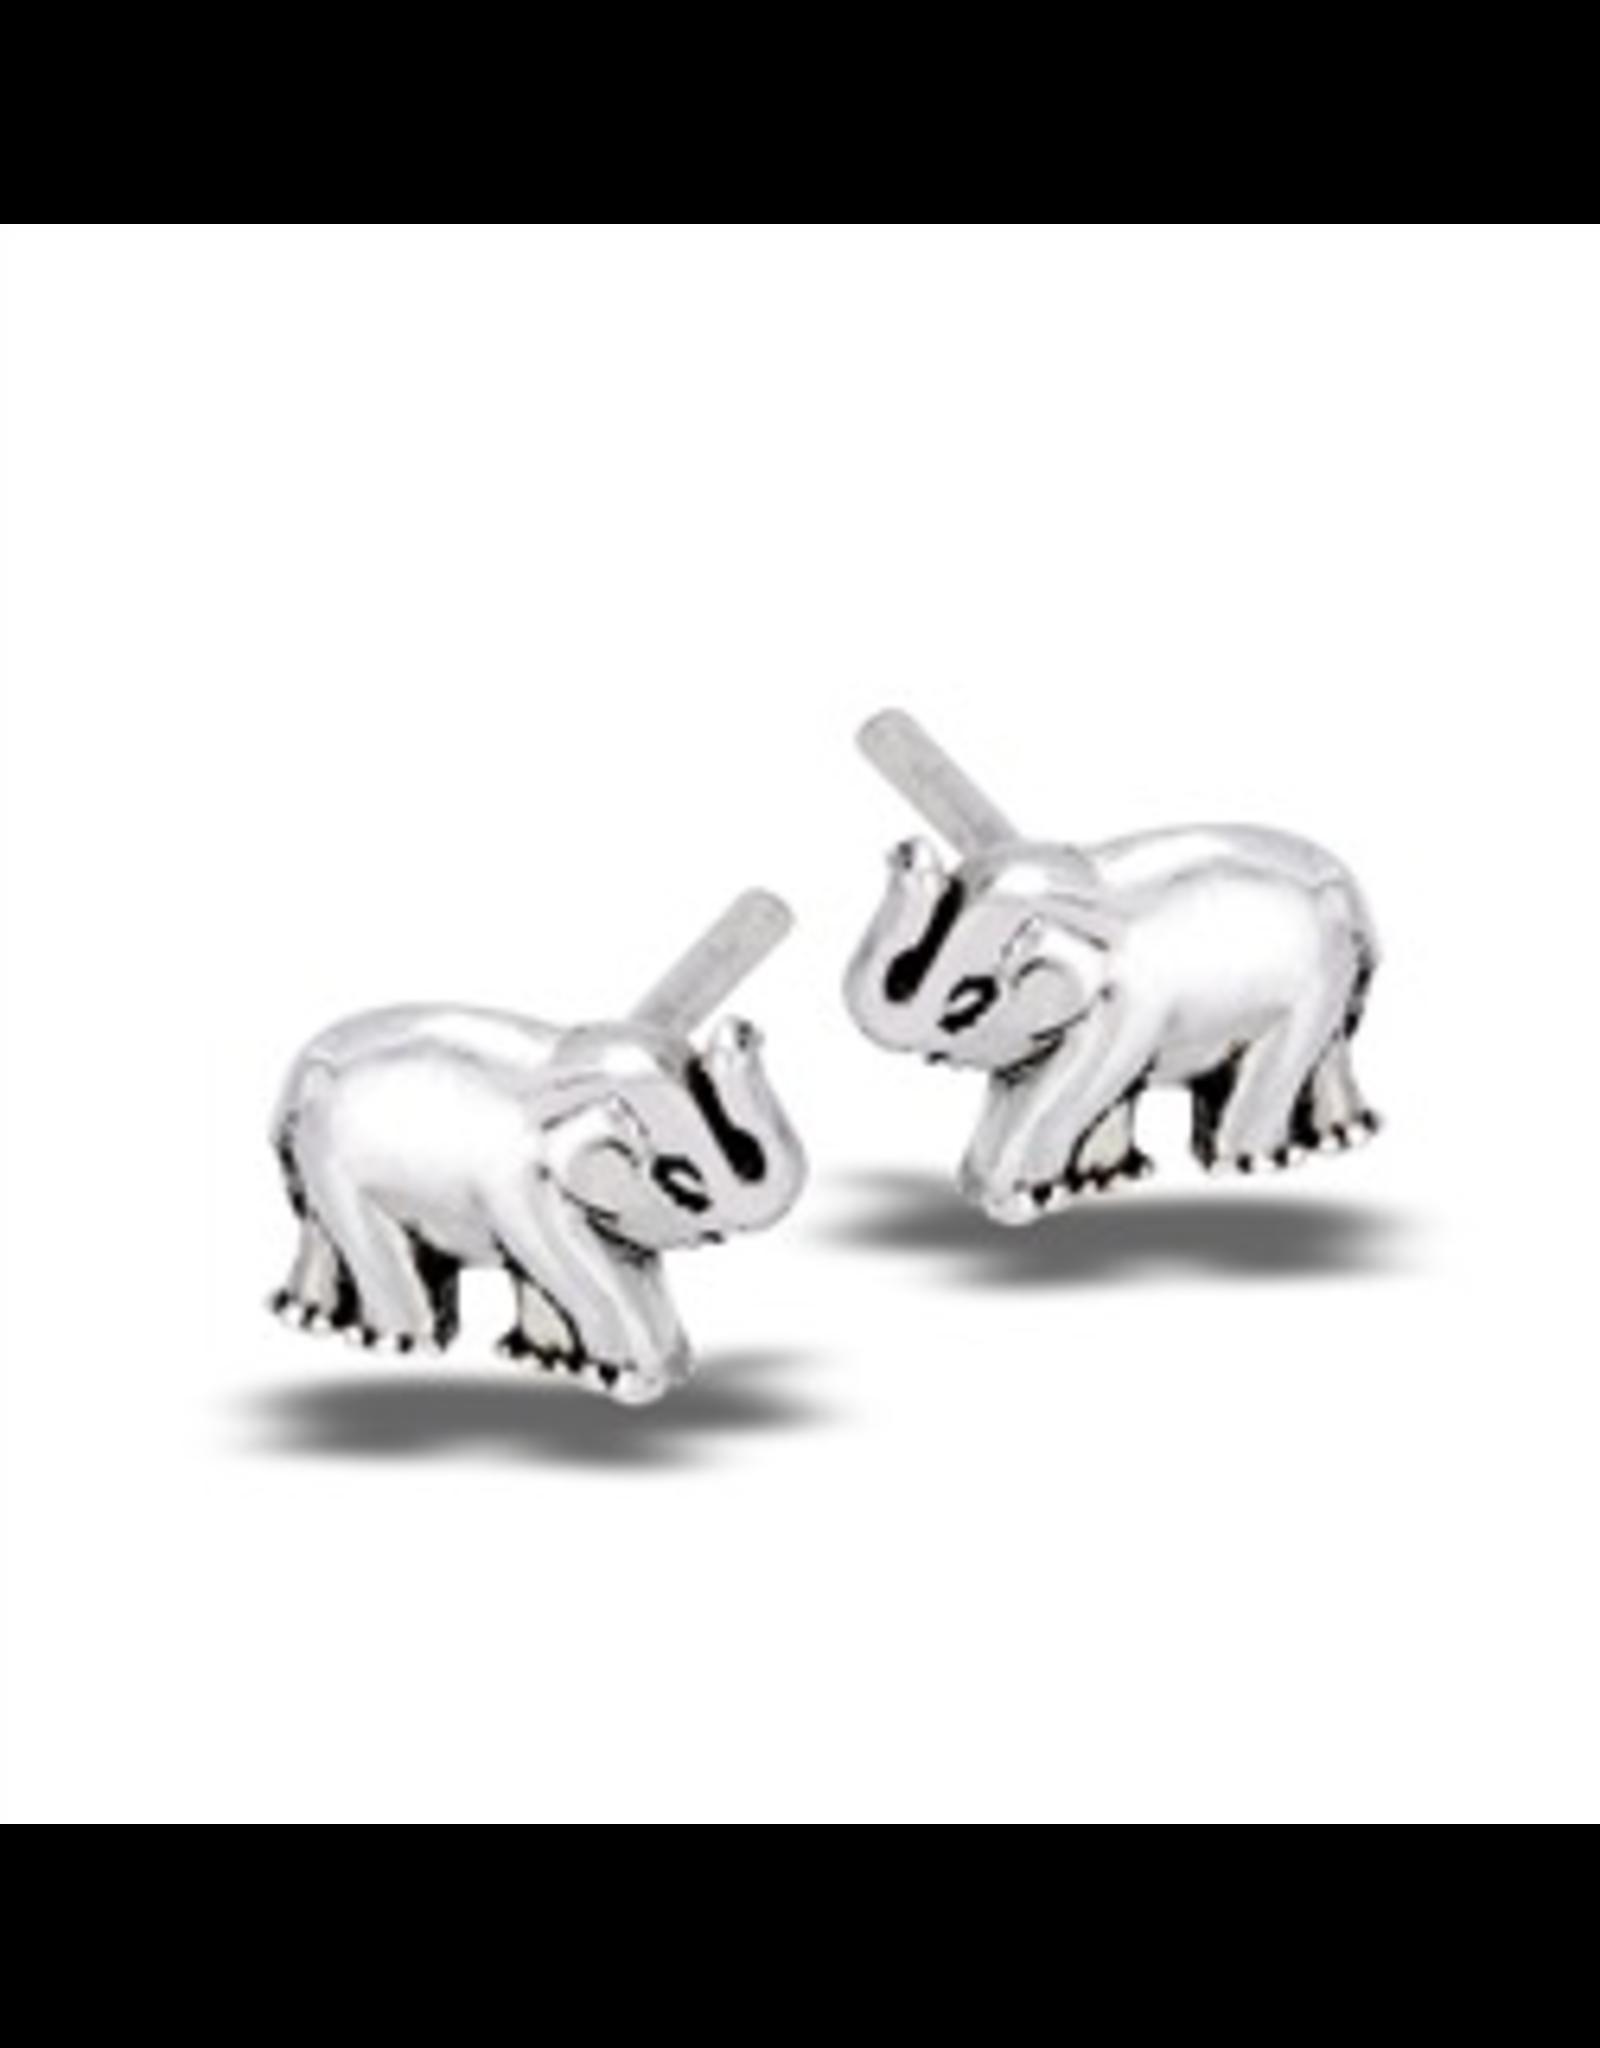 Welman S/S Baby Elephant Post Earring